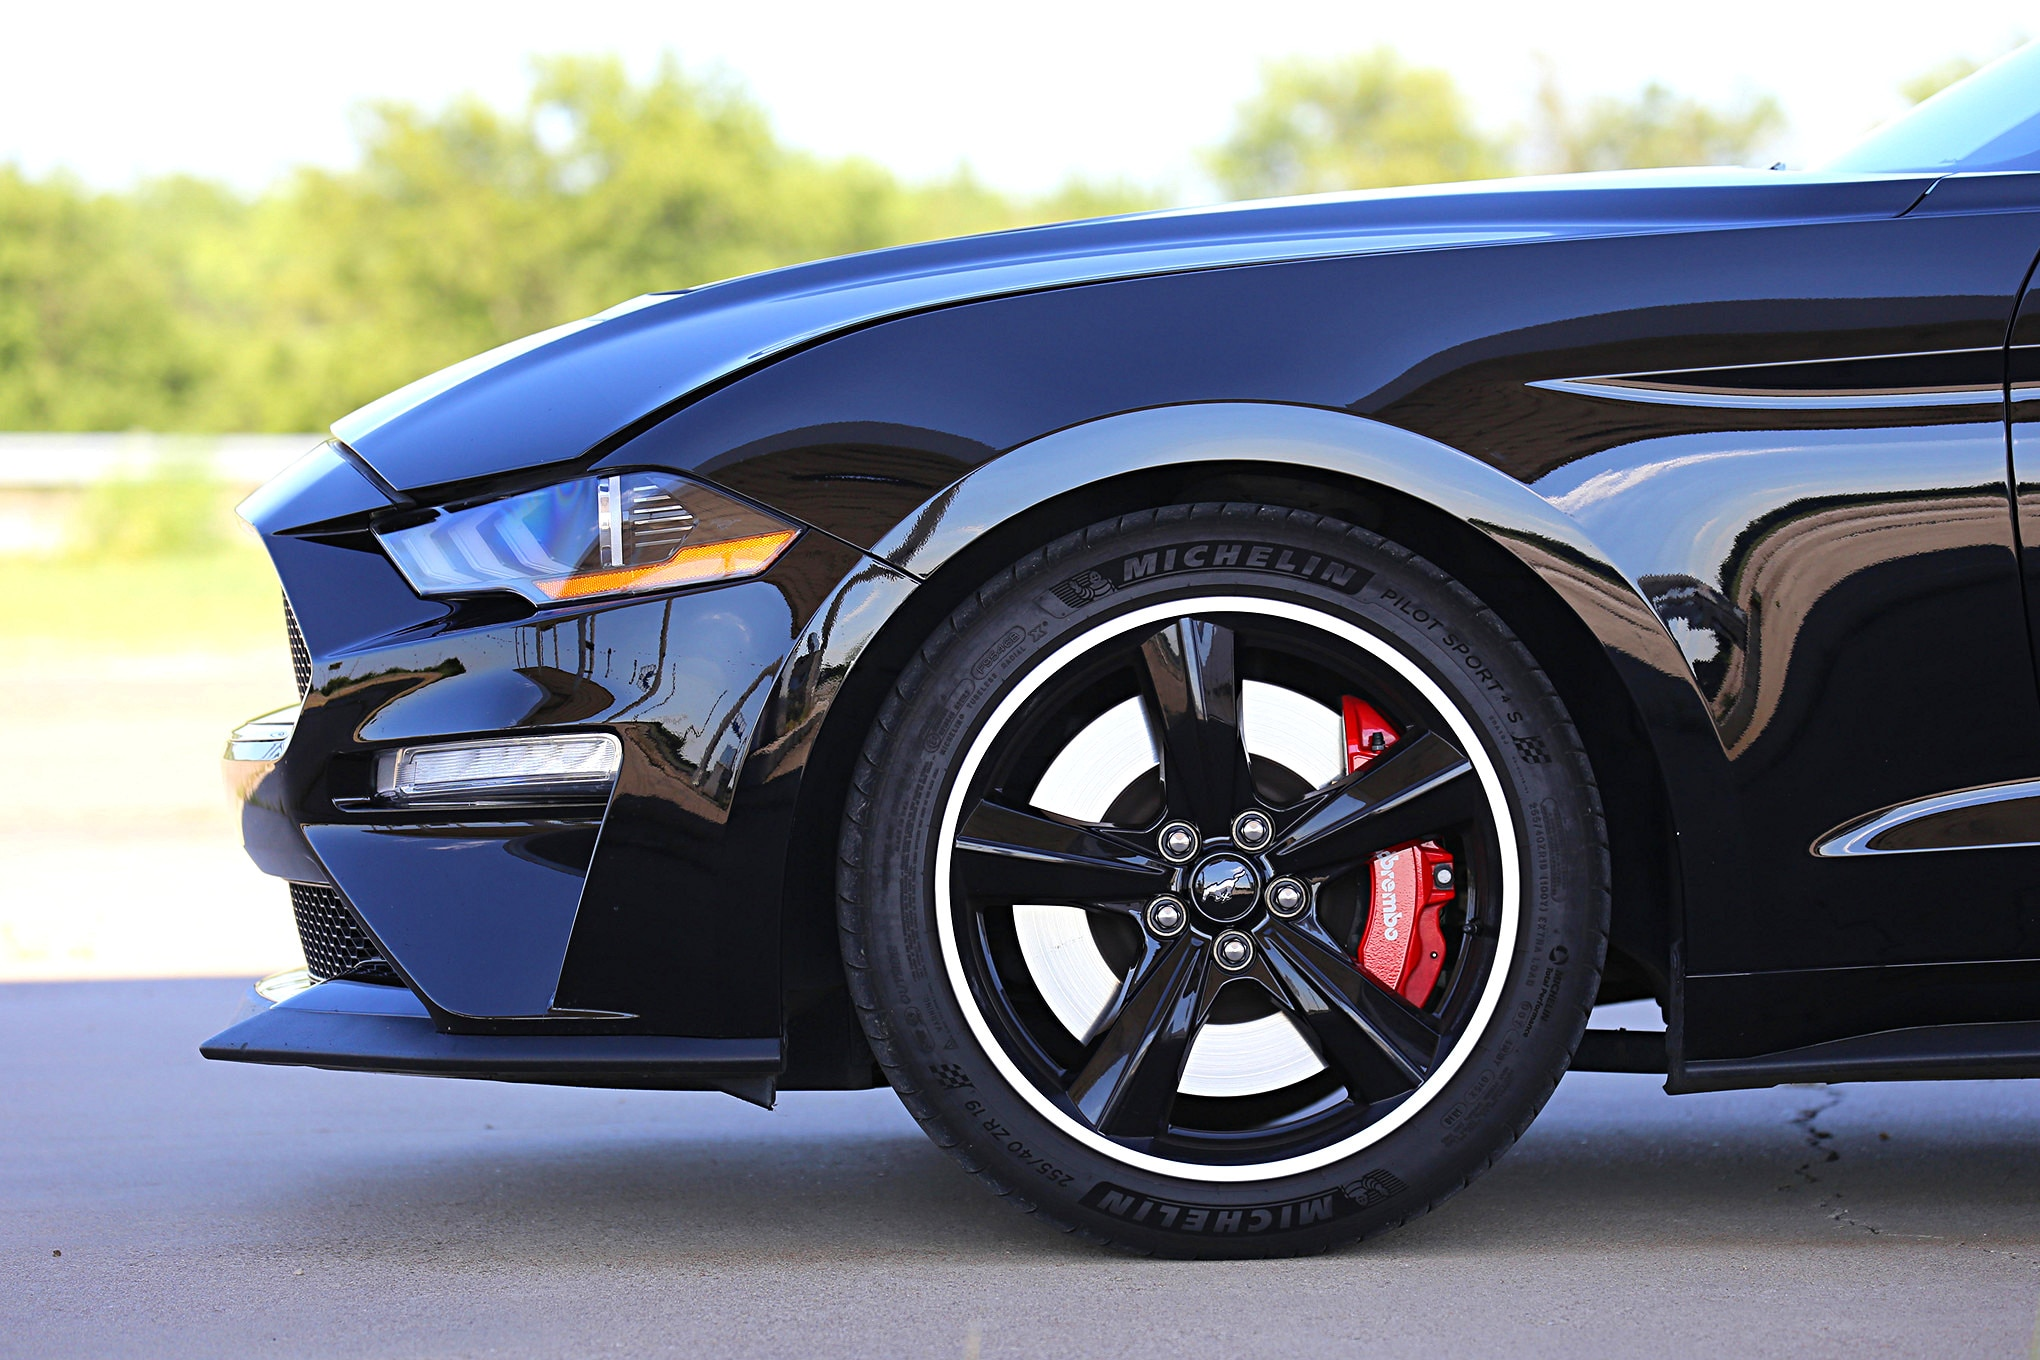 006 2019 Mustang Bullitt Drive